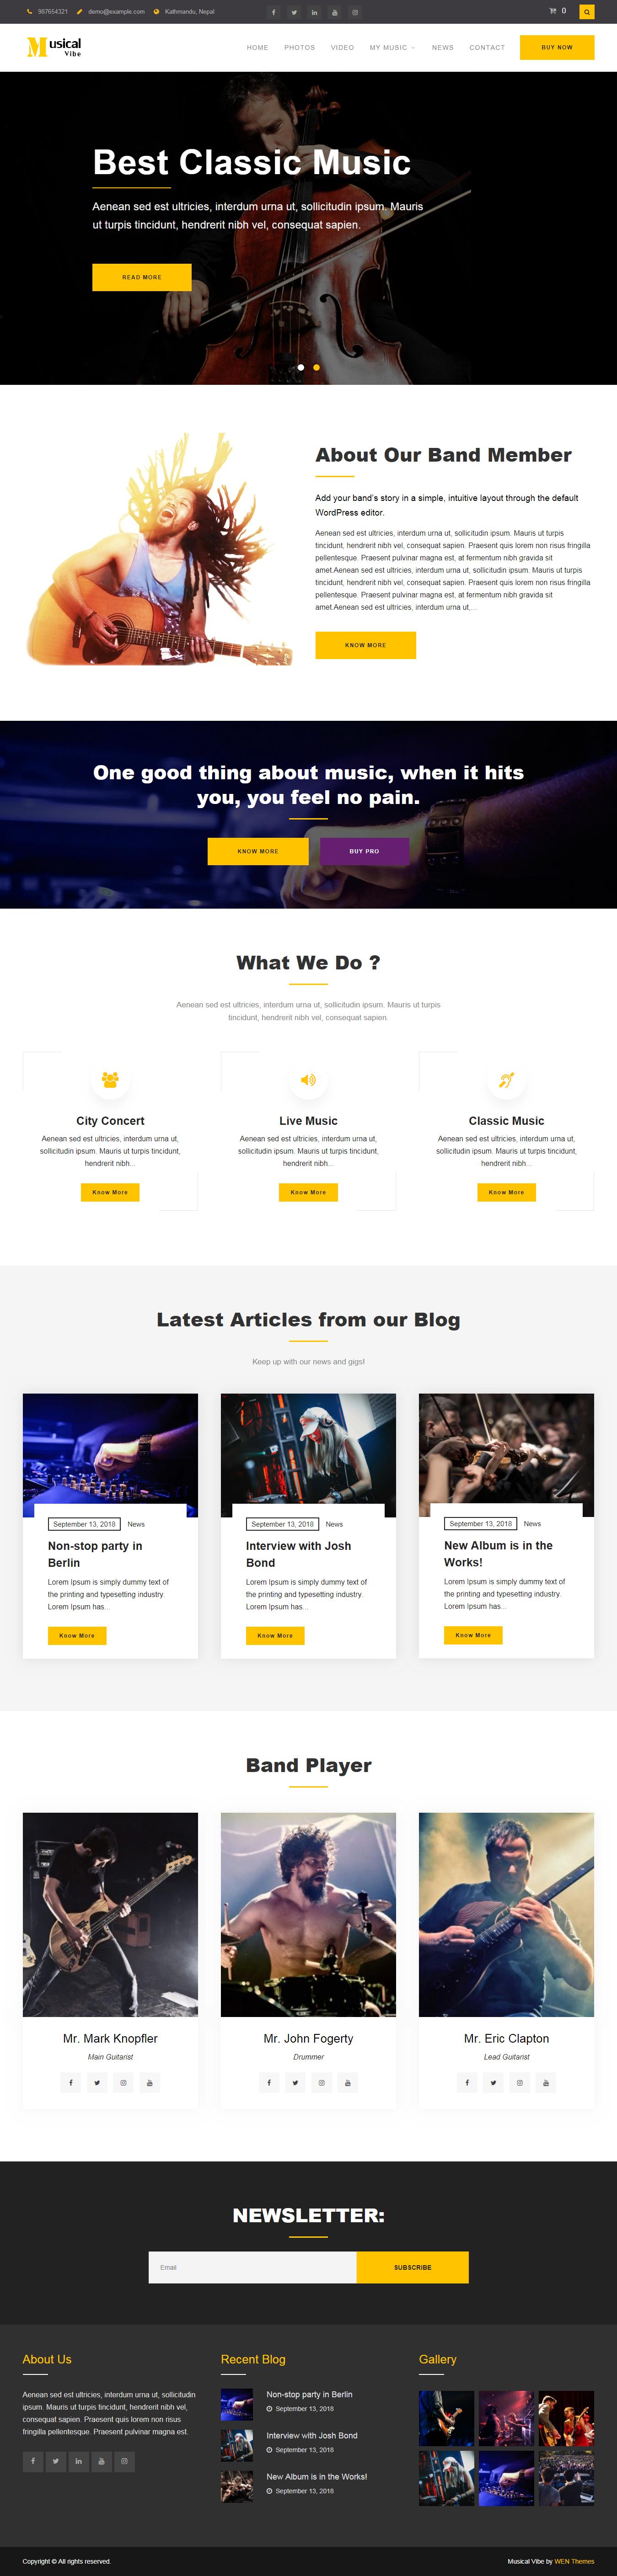 Music Vibe - Best Free Video and Music WordPress Theme